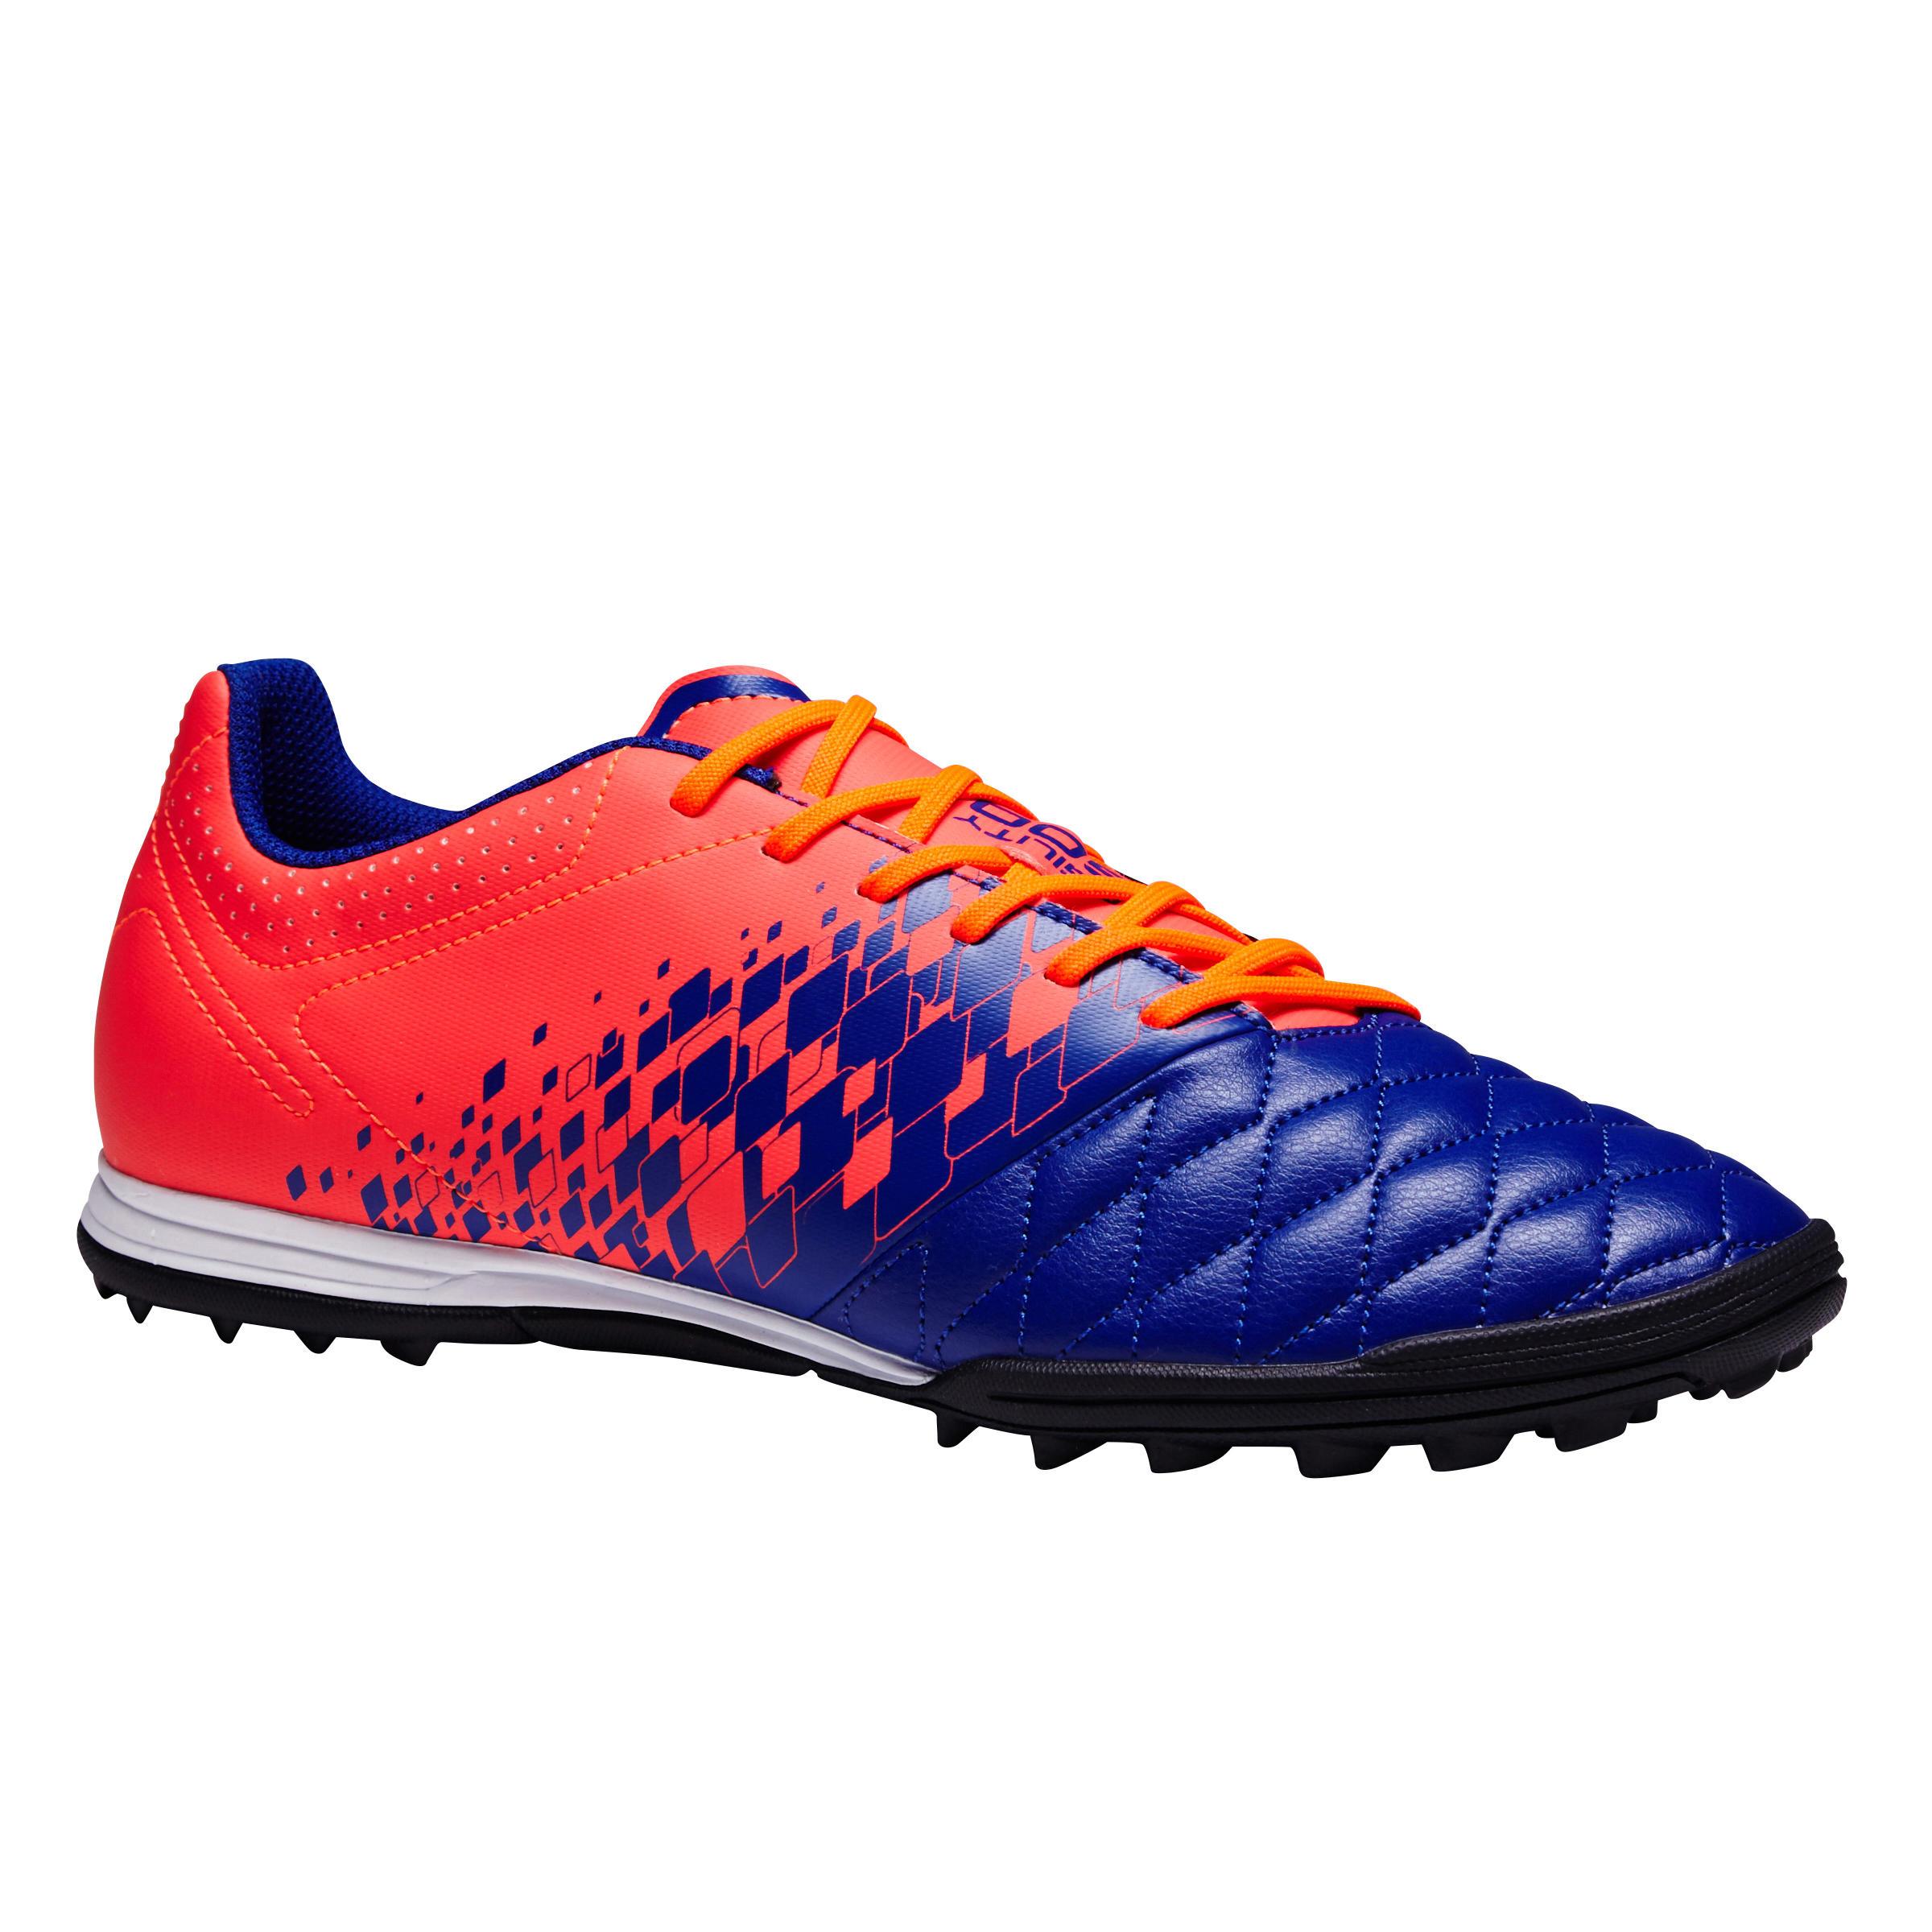 Adulteamp; Enfants Chaussures Chaussures Football De De WrdexCBo